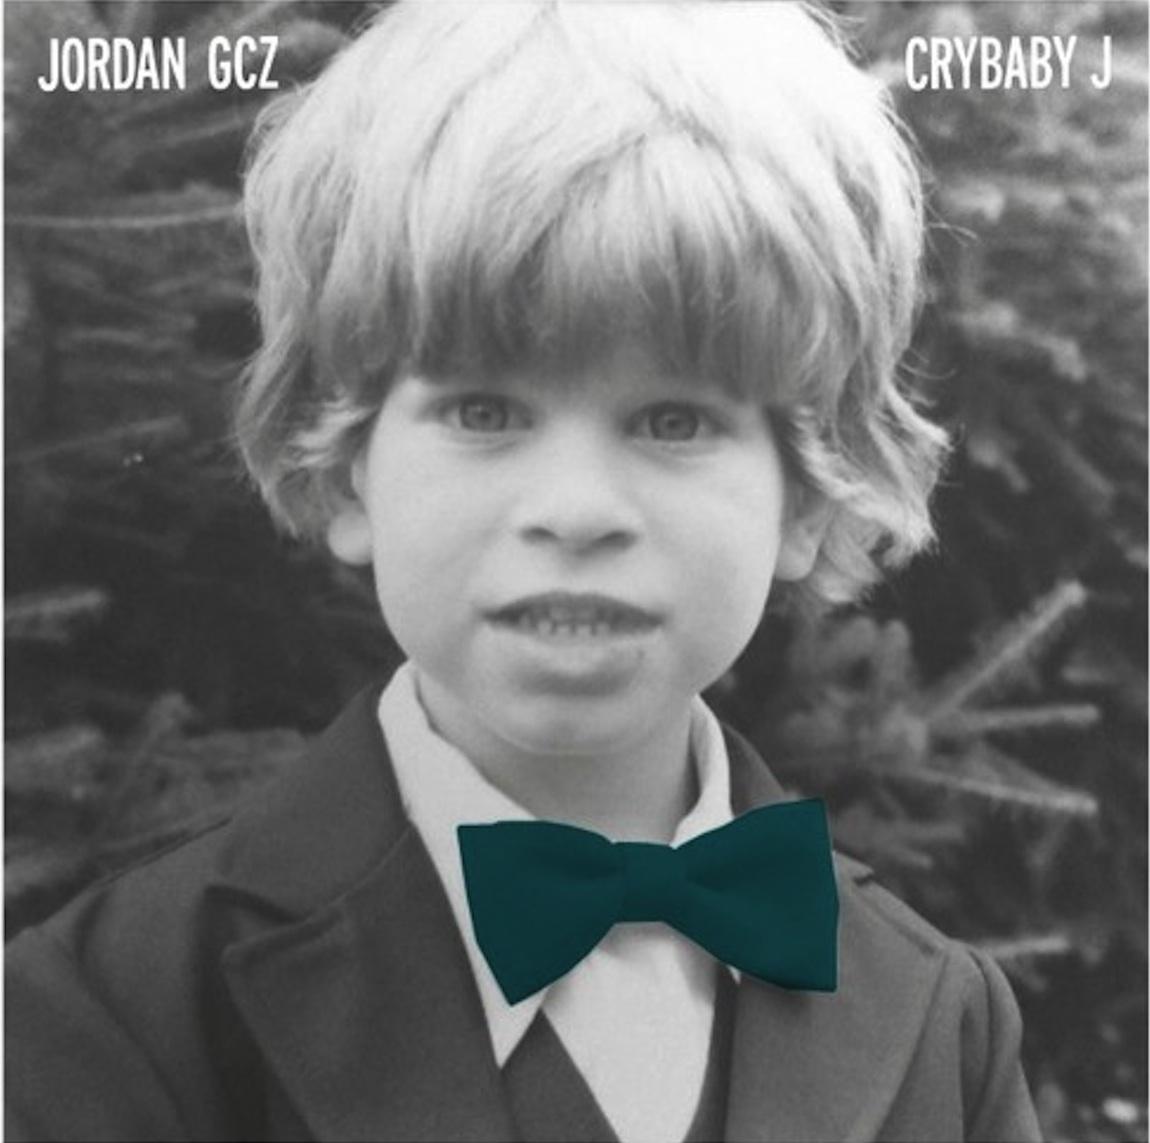 Test Pressing, Promo`d, Reviews, Dr Rob, Jordan GCZ, Cry Baby J, JuJu & Jordash, Off Minor